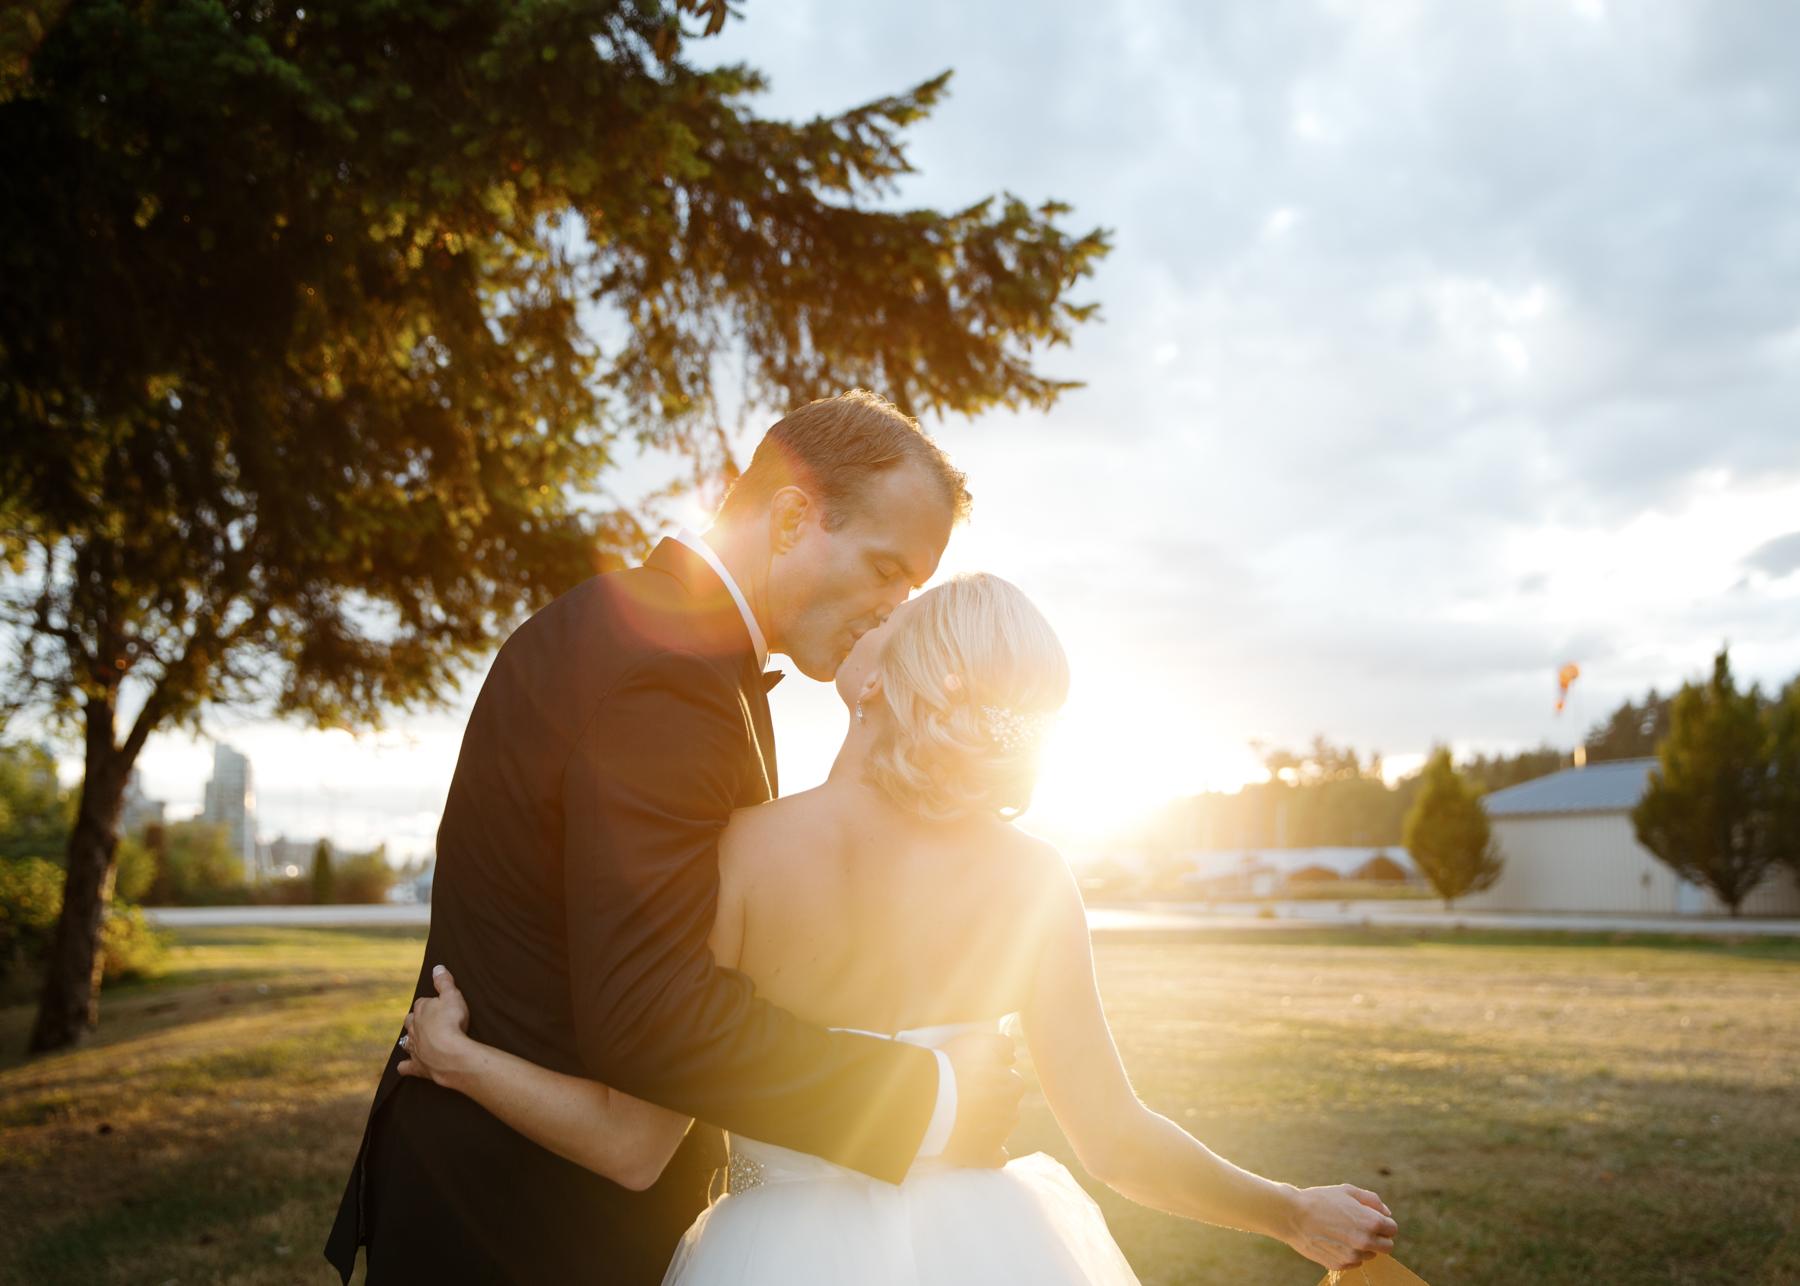 kaoverii_silva_photographer_via-herafilms_kelly_mike_wedding-29.jpg